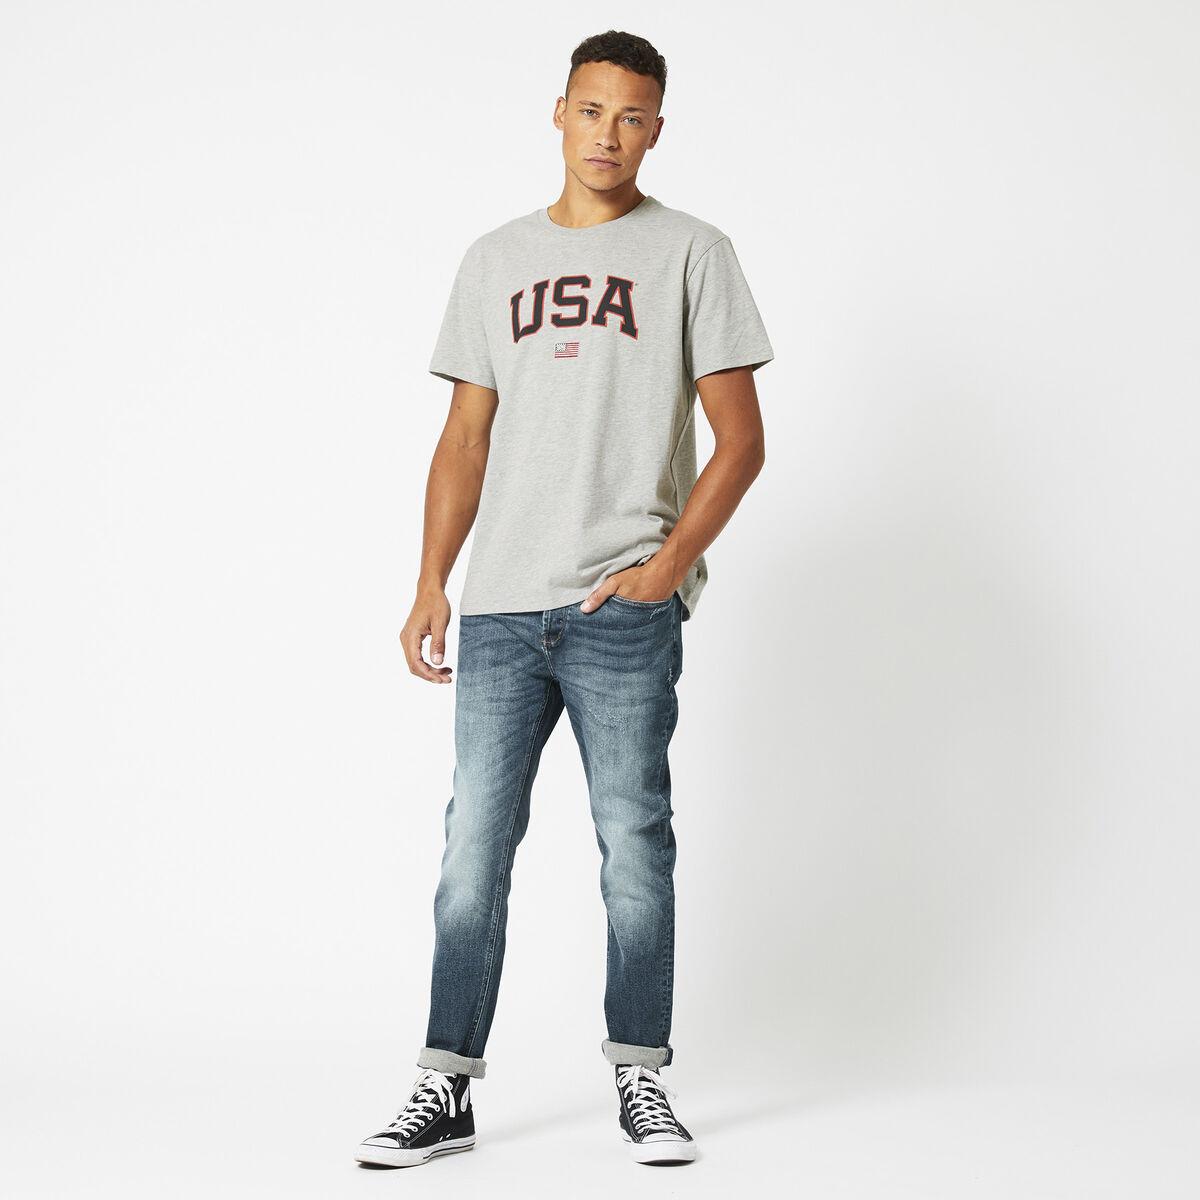 T-shirt Emerson USA